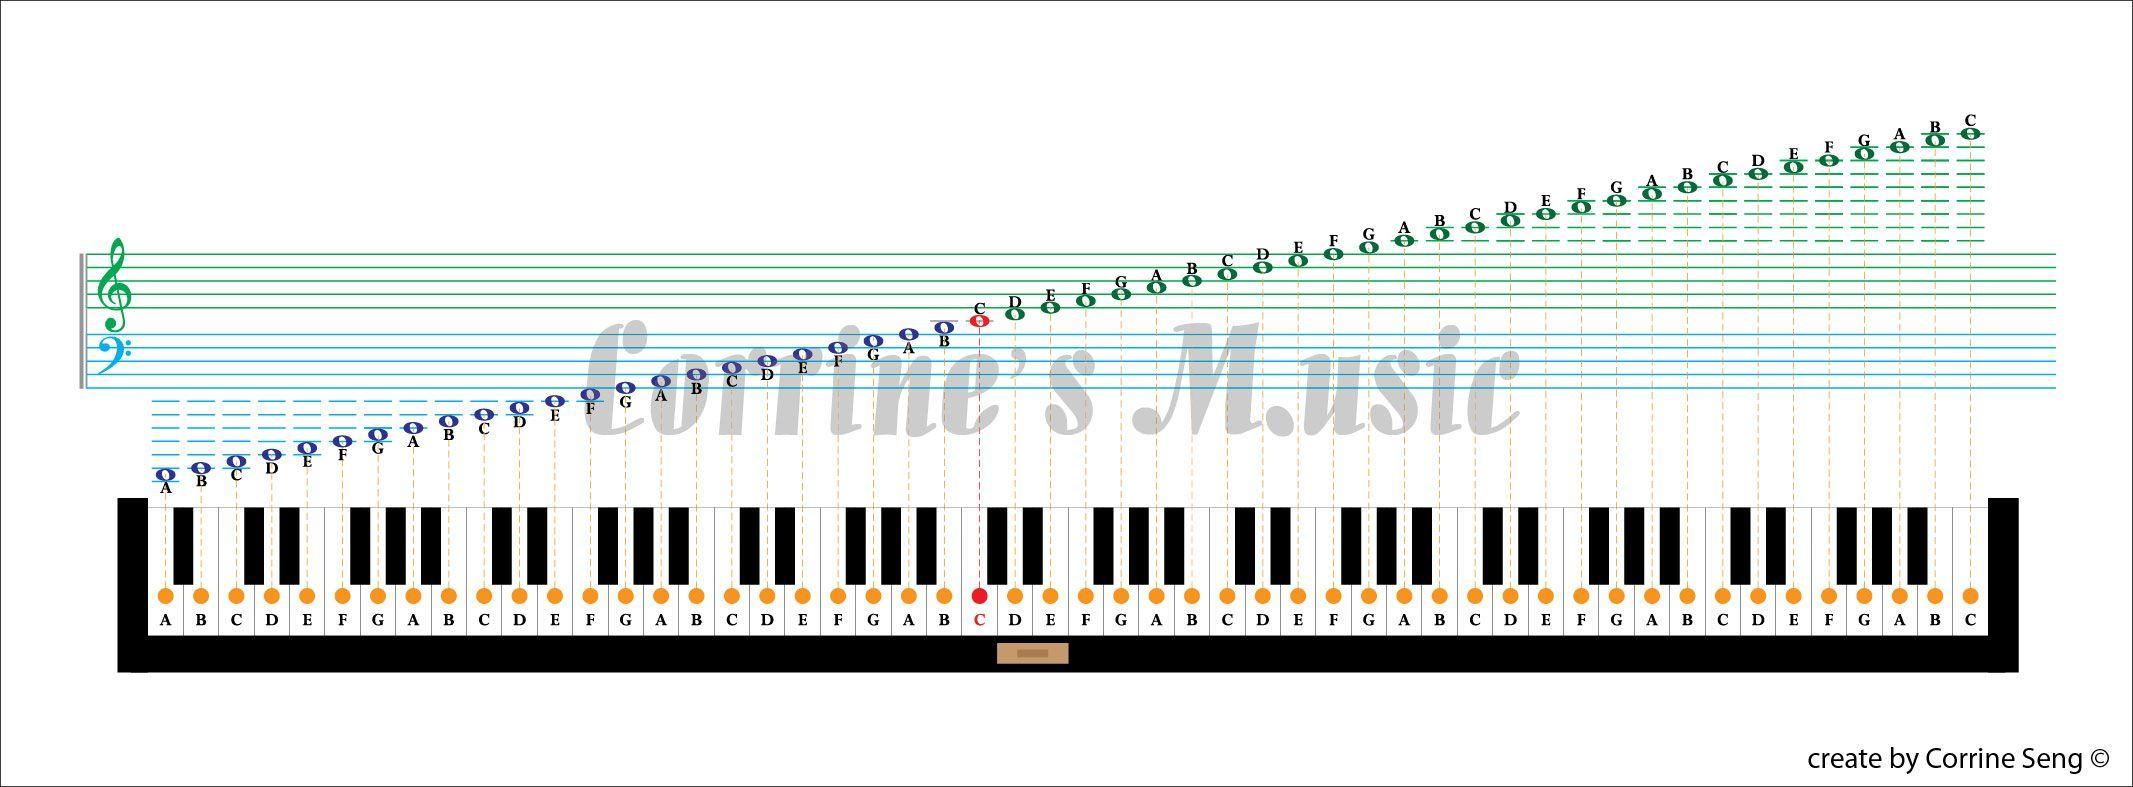 88 key piano keyboard diagram speaker amp wiring complete keys notes chart pretty pinterest